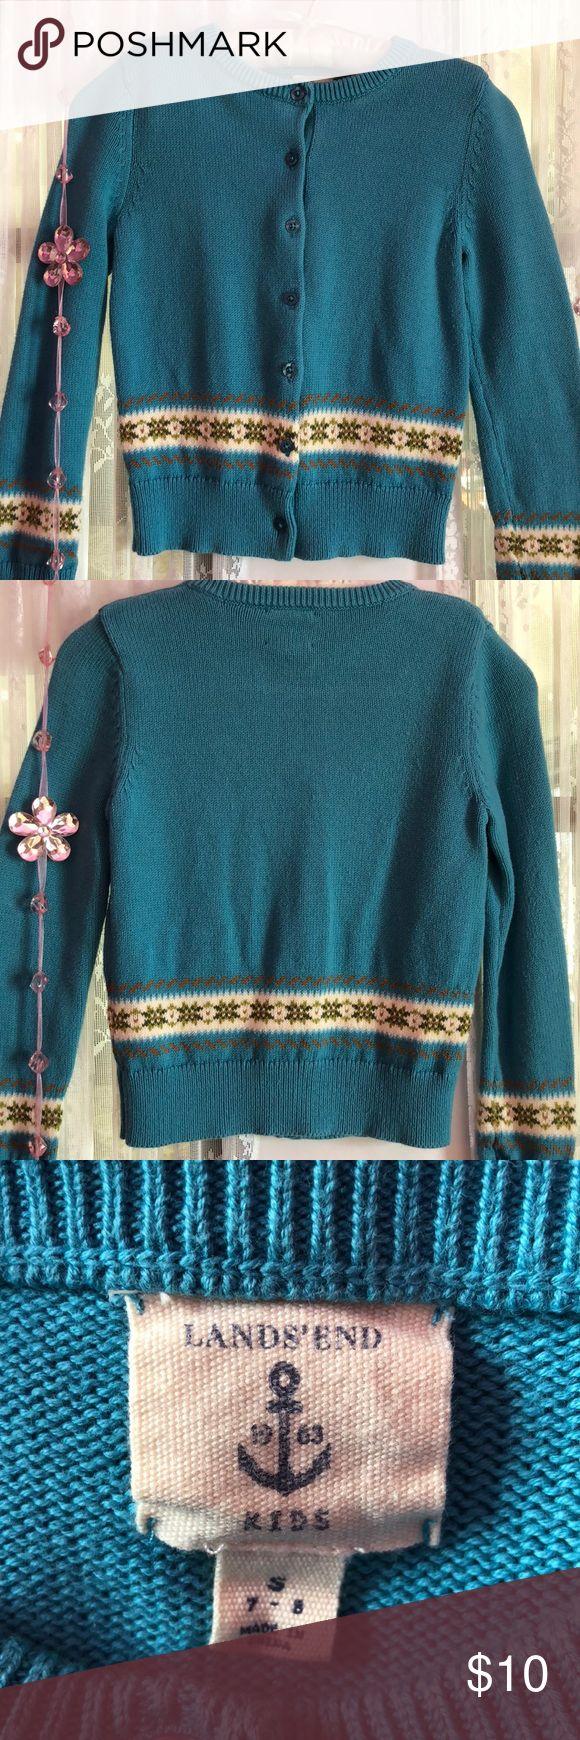 Lands End Kids Cardigan Lands End Kids button down Cardigan 100% cotton size 7/8 Lands' End Shirts & Tops Sweaters